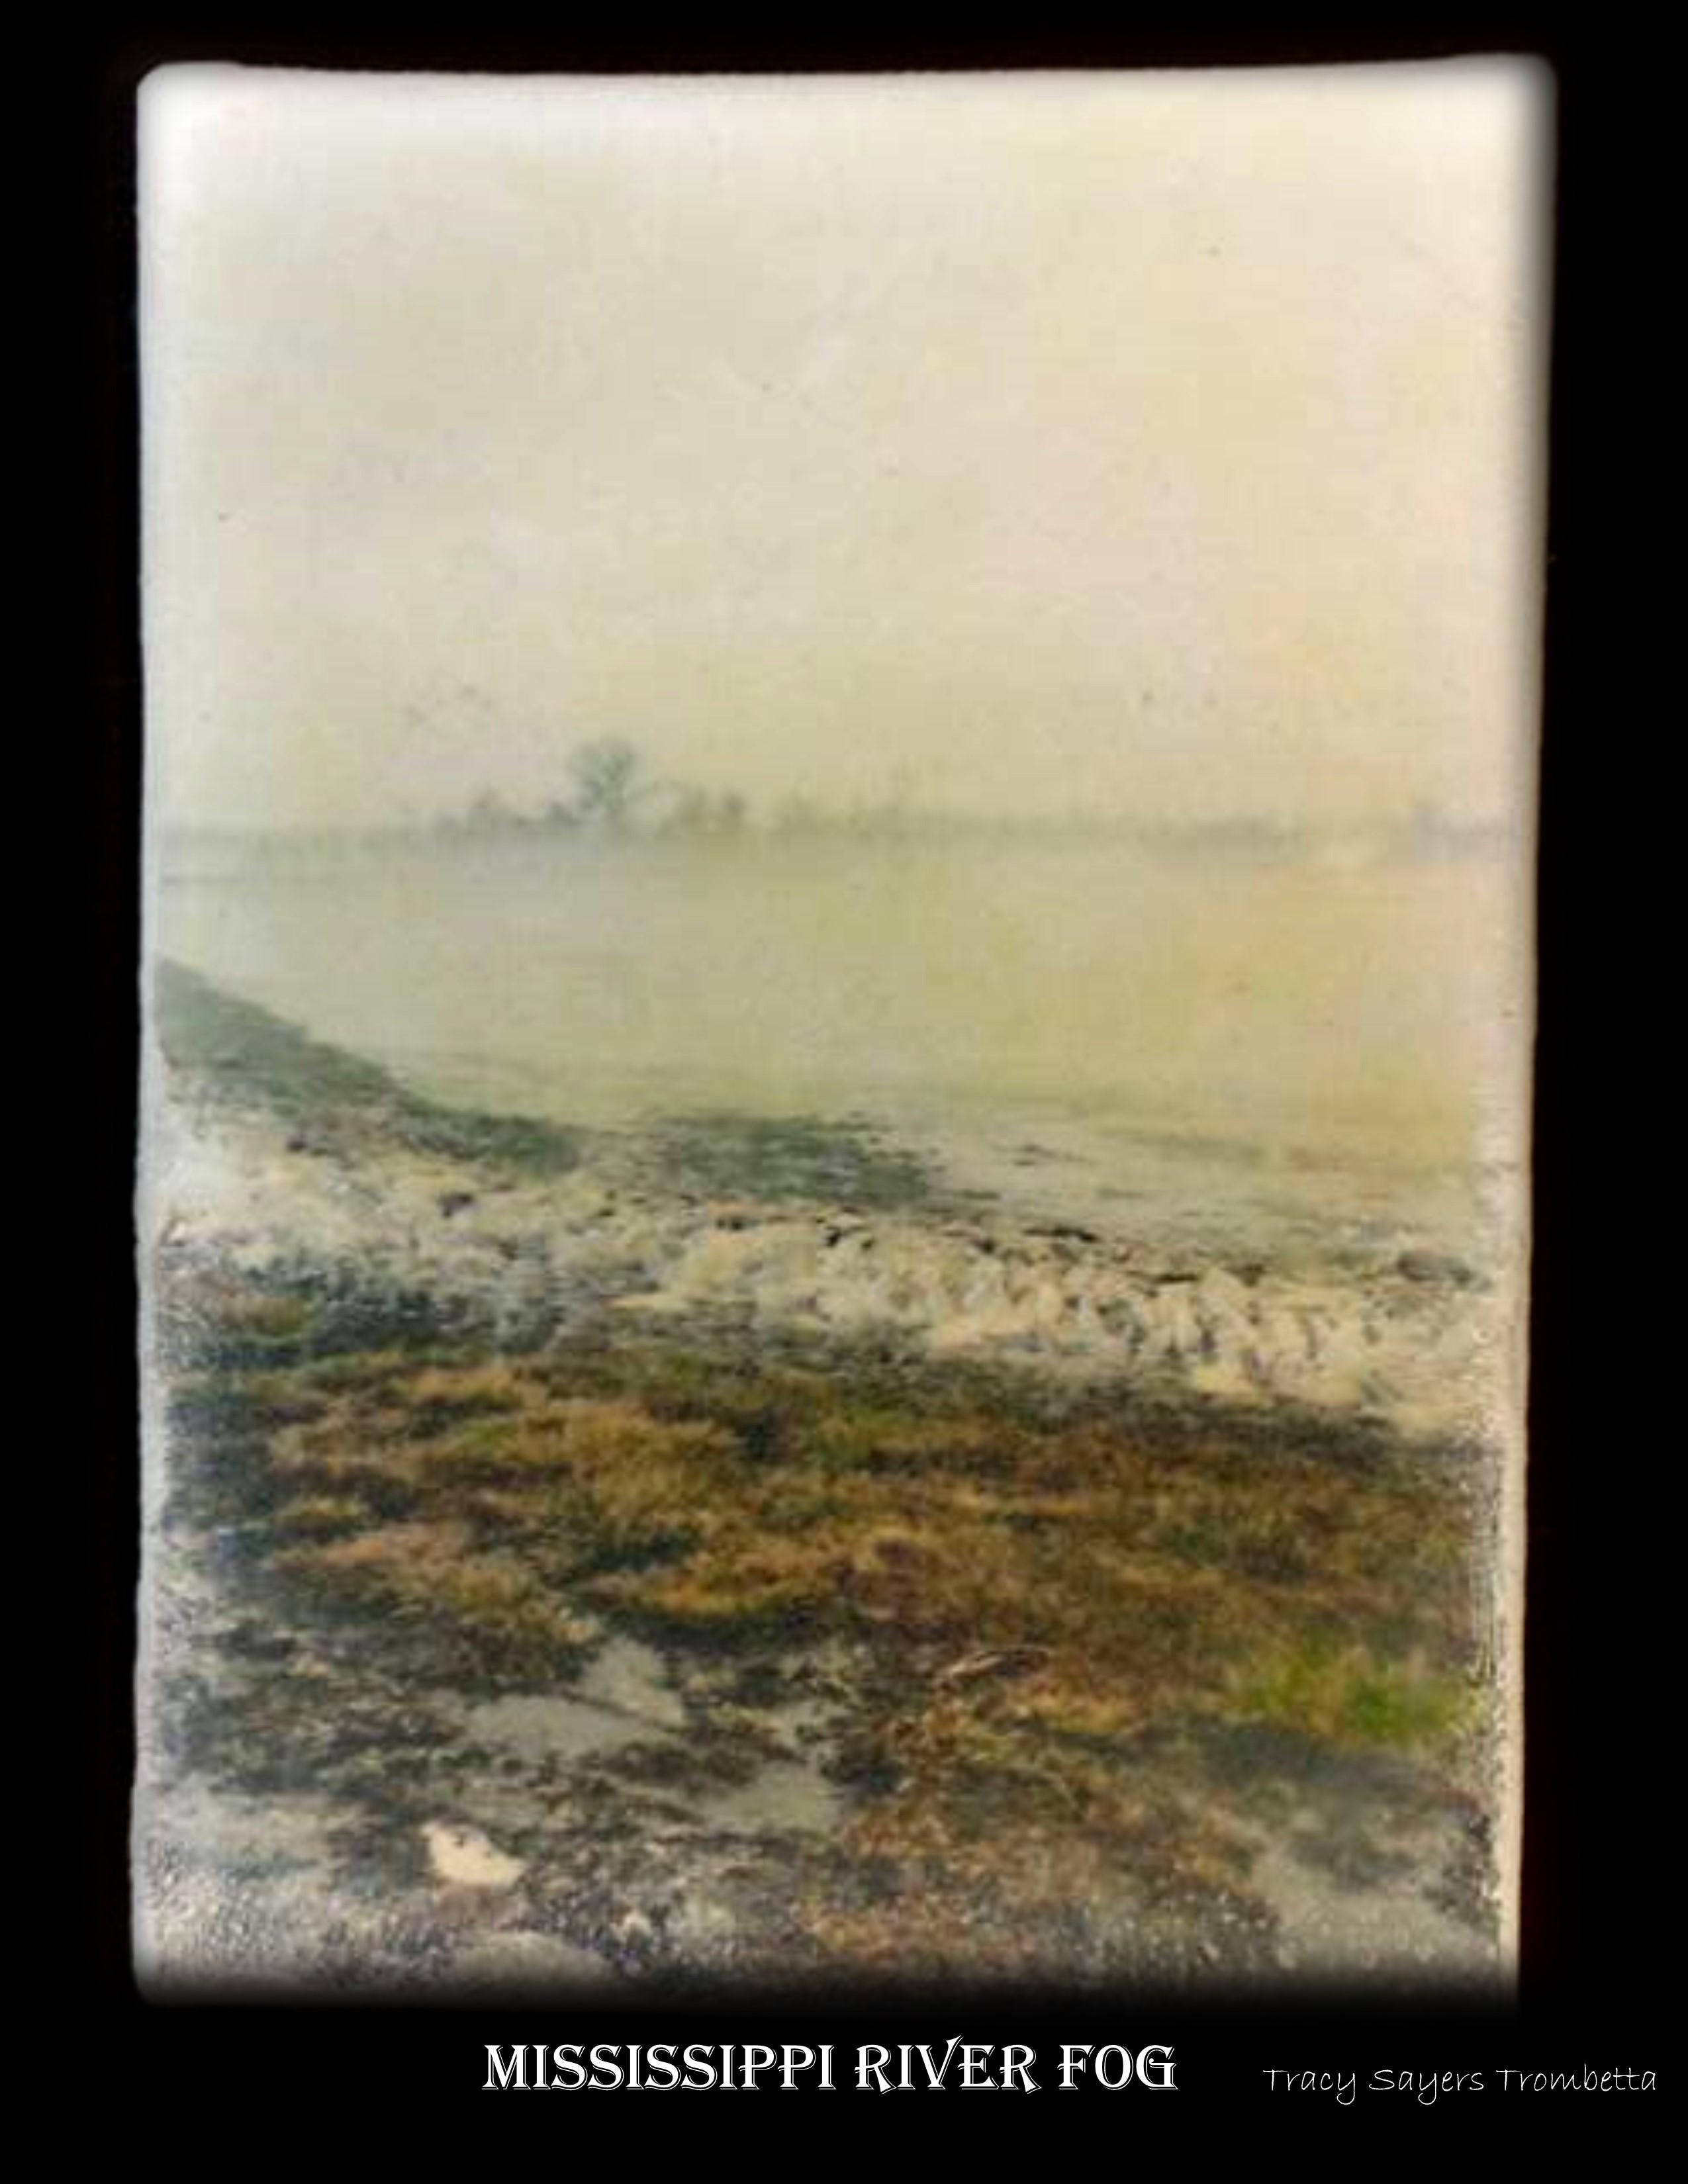 Mississippi River Fog